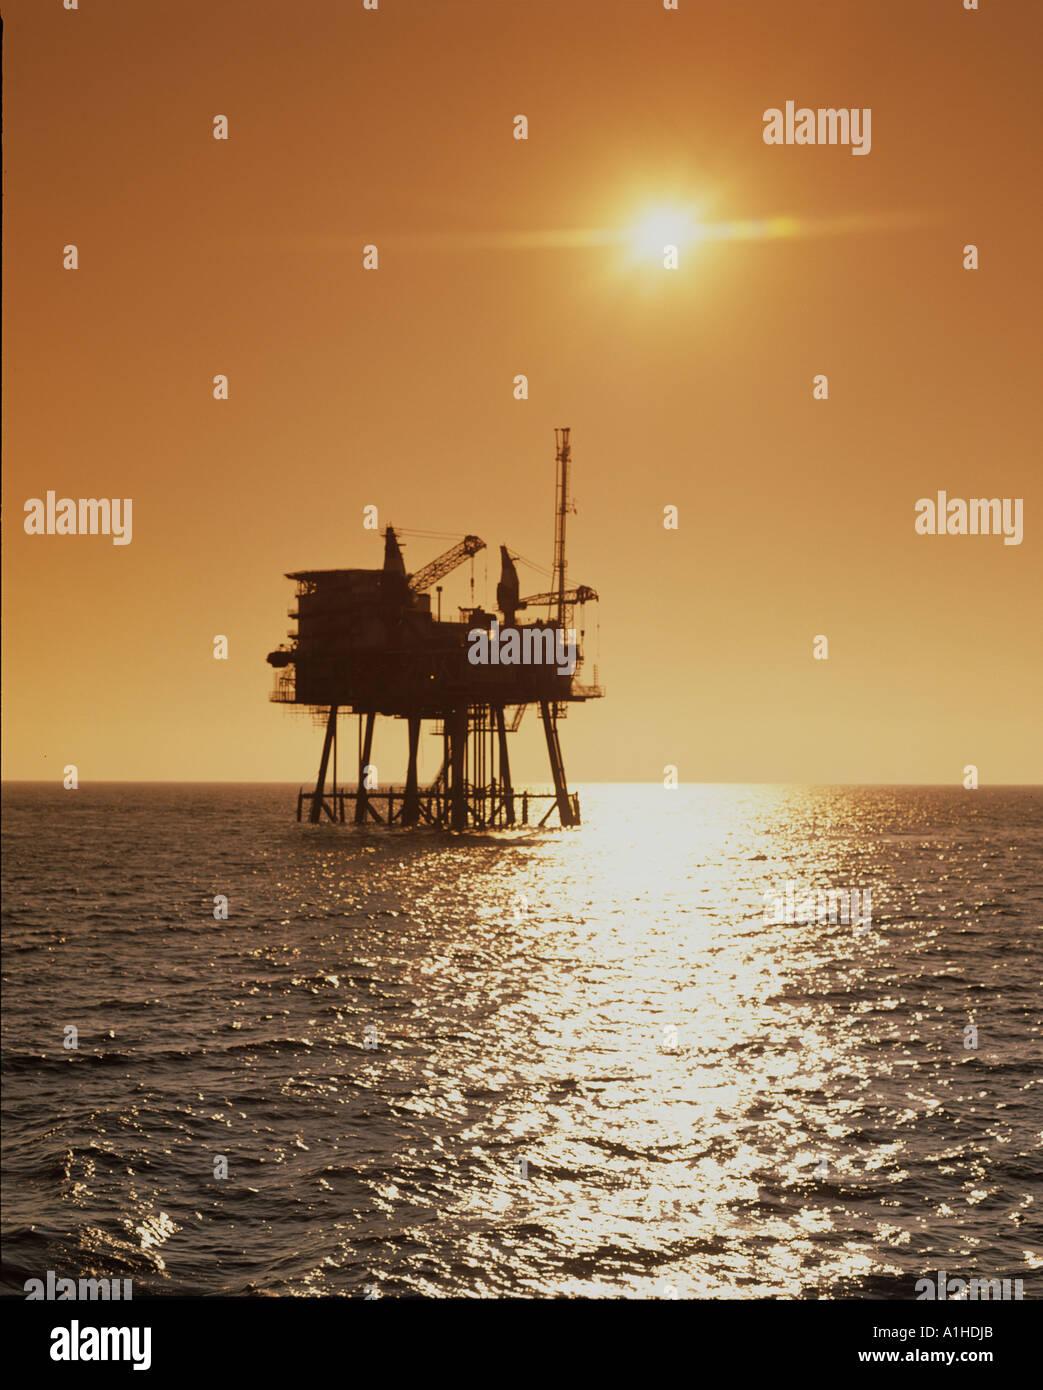 oil gas exploration platforms in the atlantic ocean Stock Photo